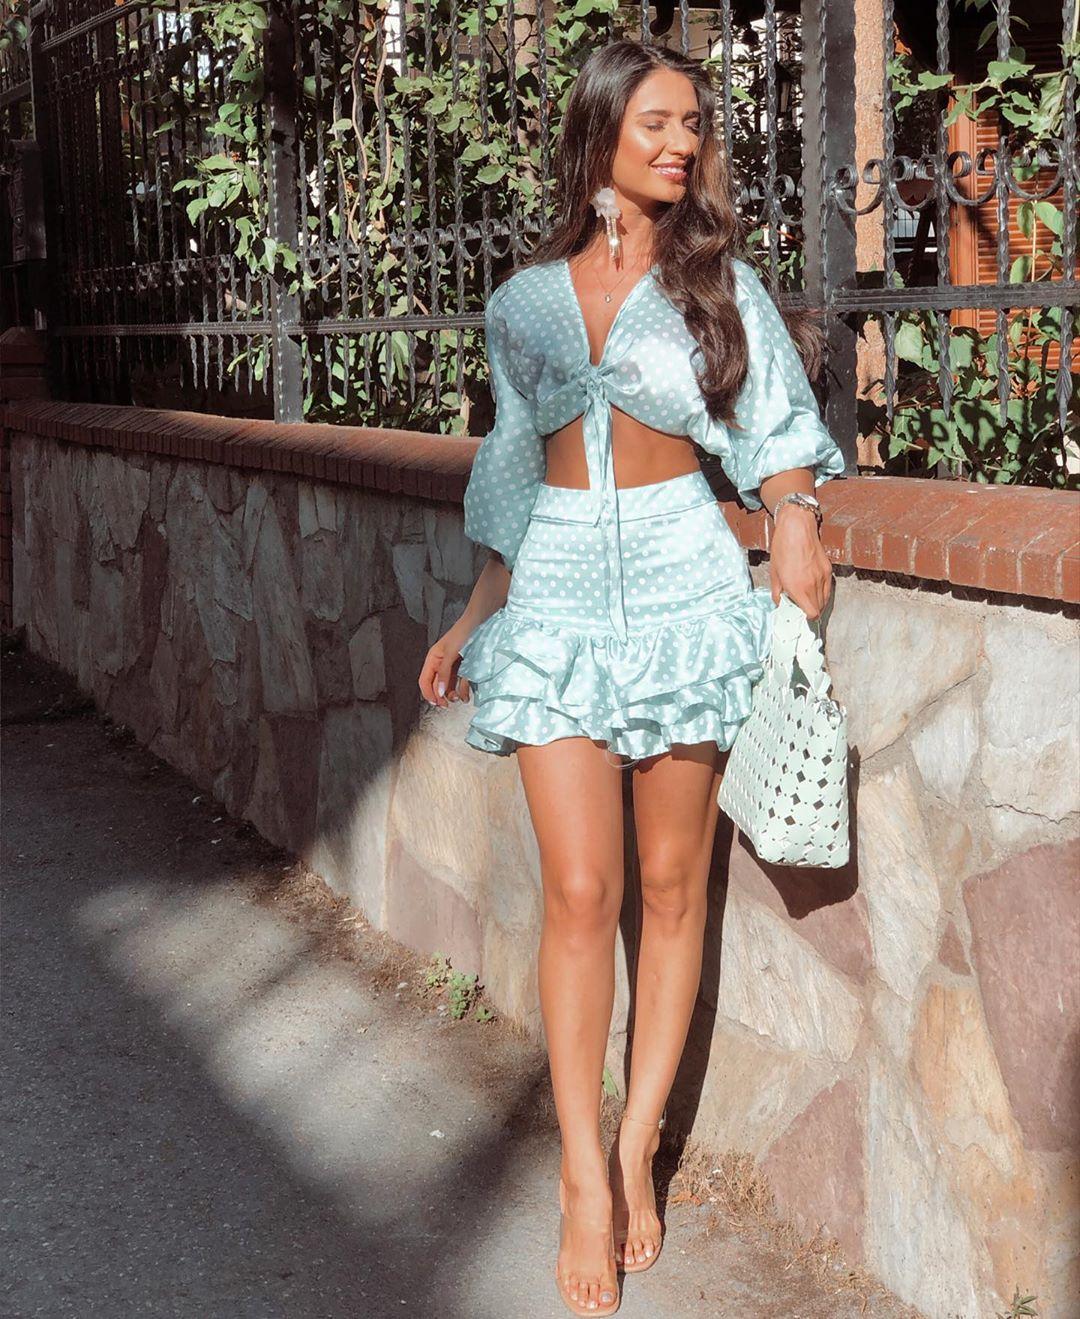 jacquard top with polka dots and bow de Zara sur yasmin_tz